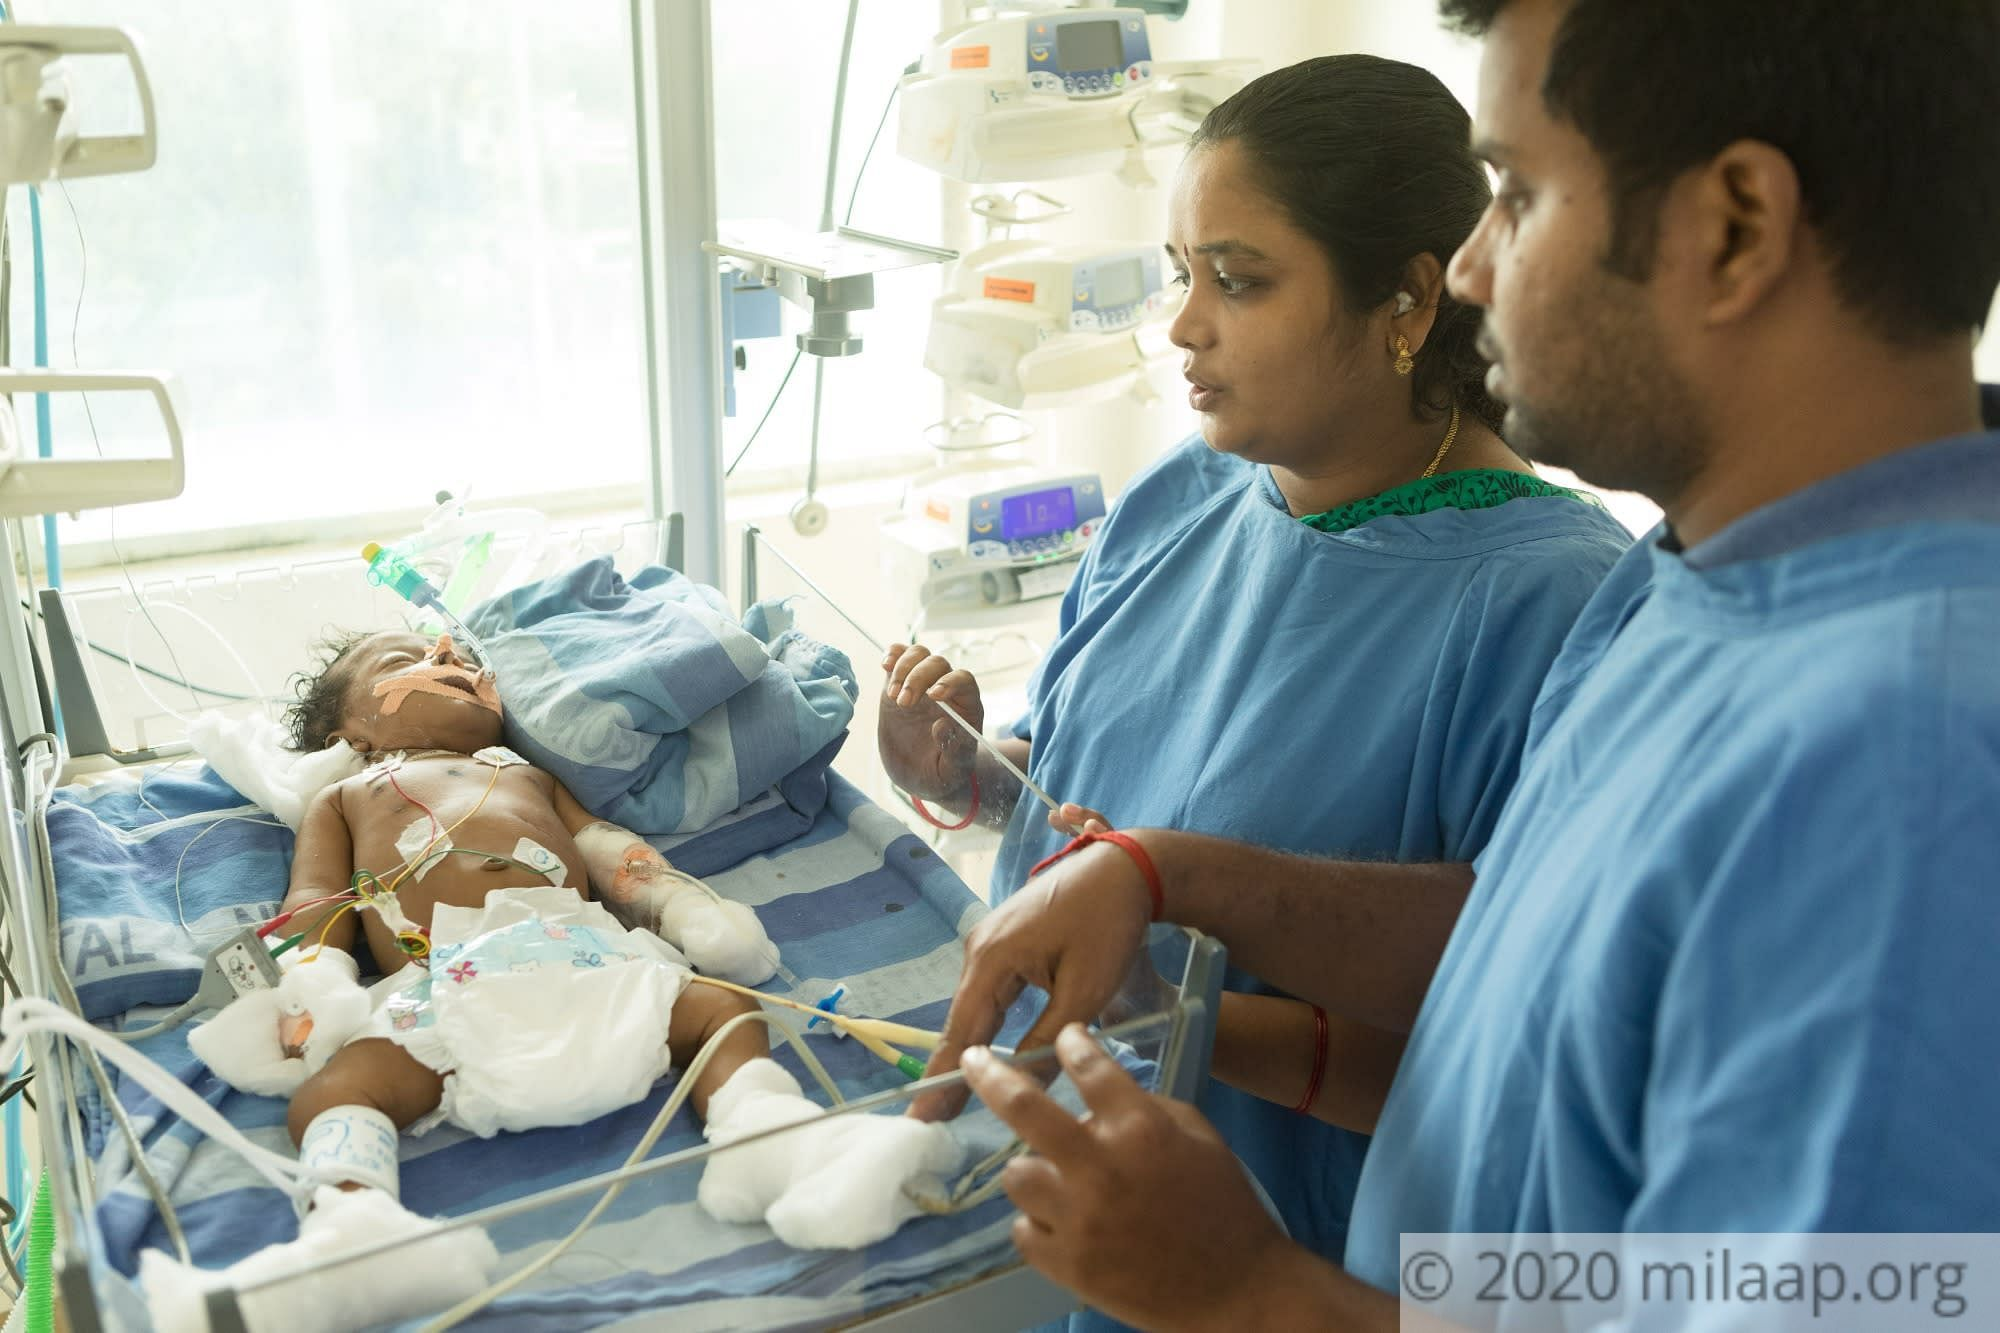 Baby of swathi 2 zbw9l0 1574681936